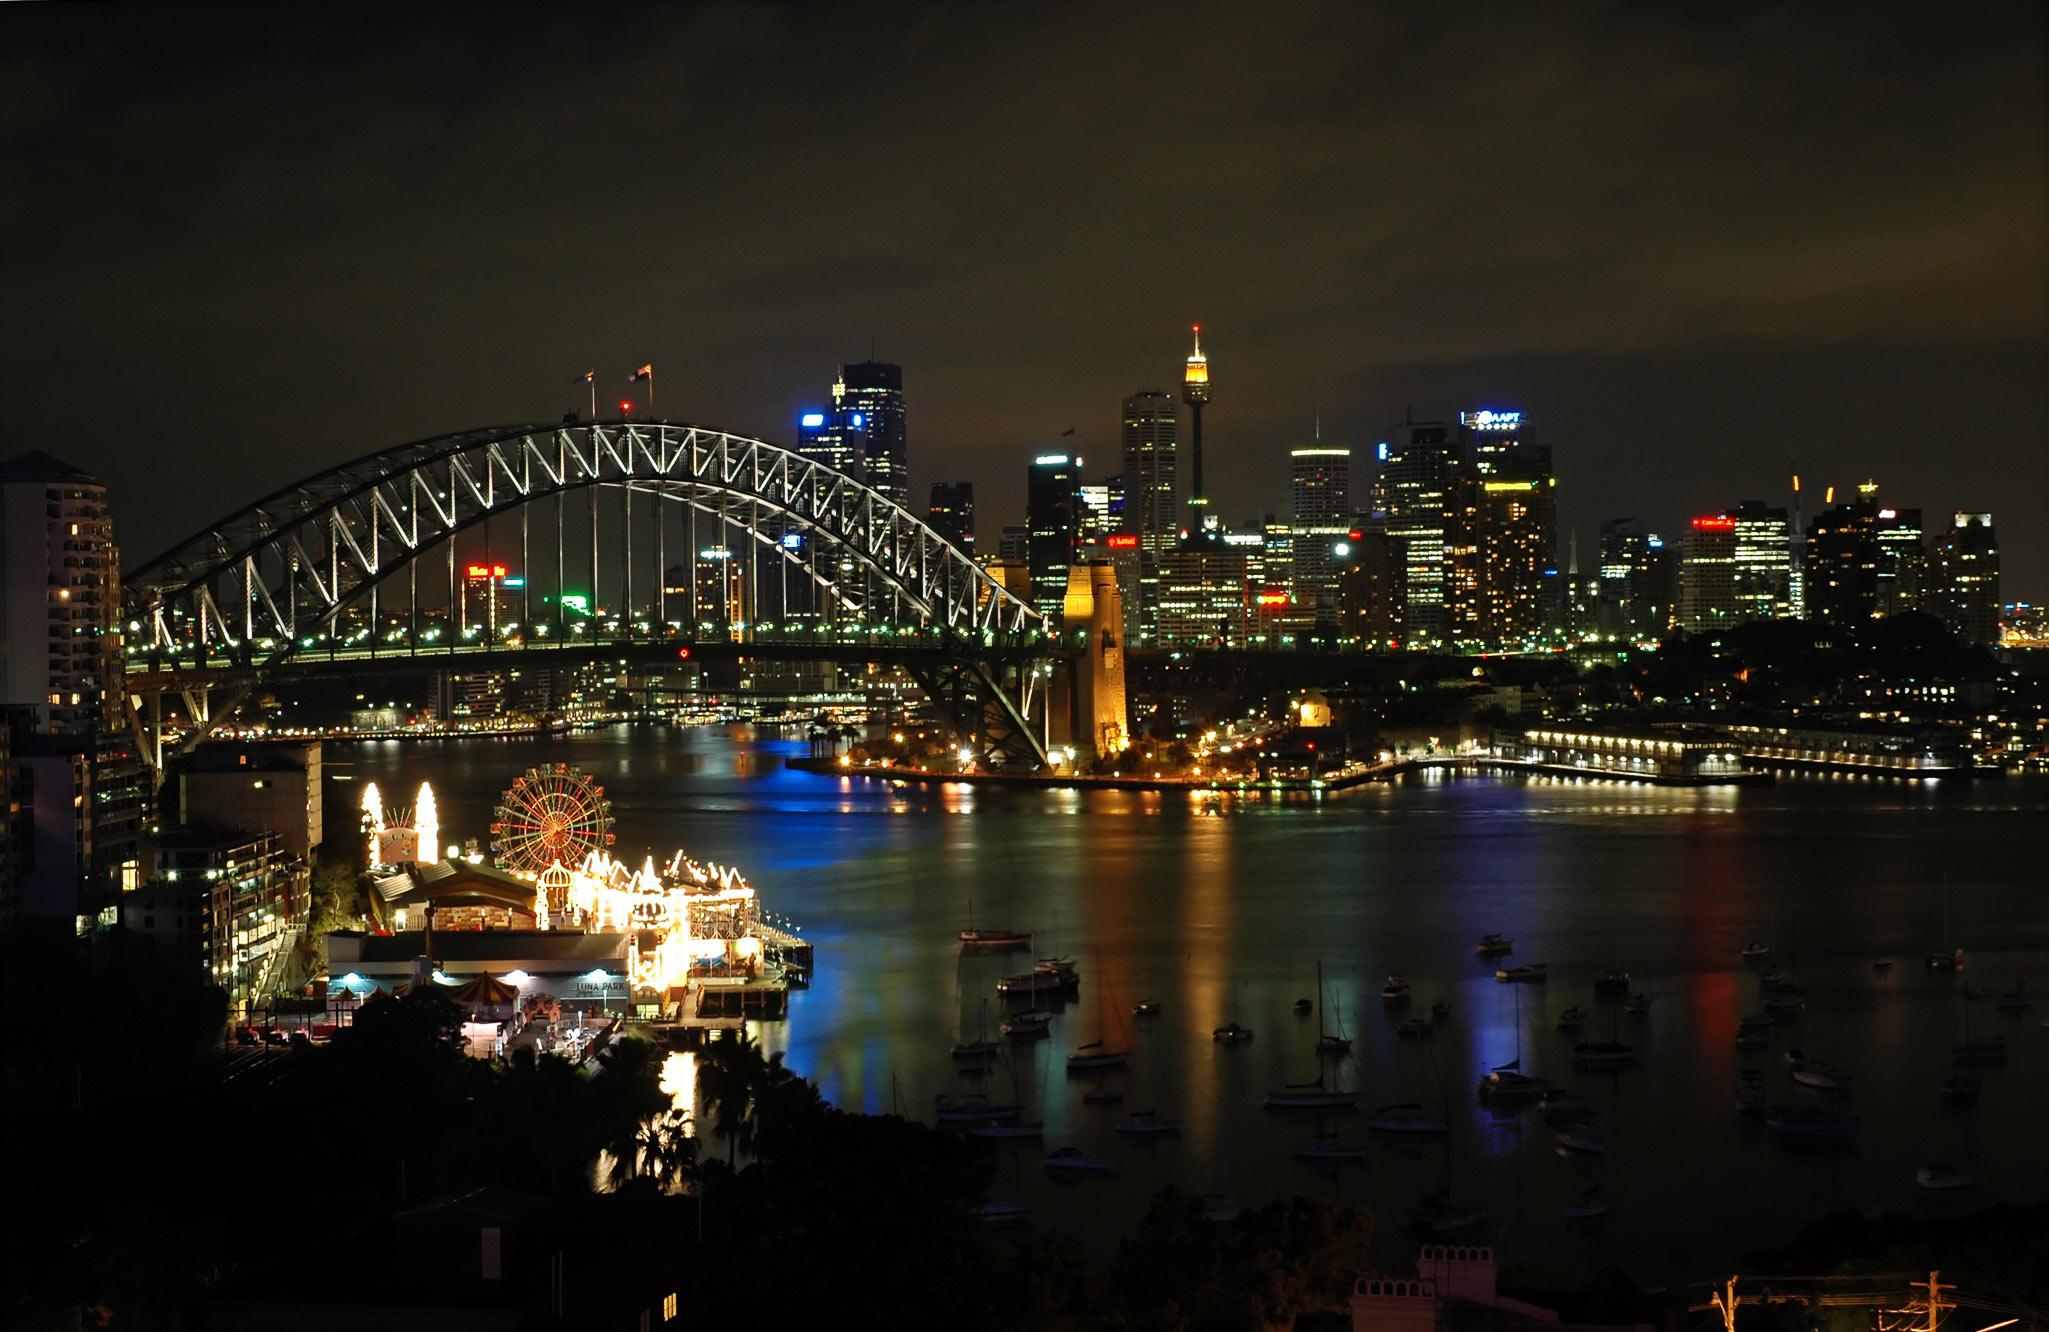 SydneyHarbor_1